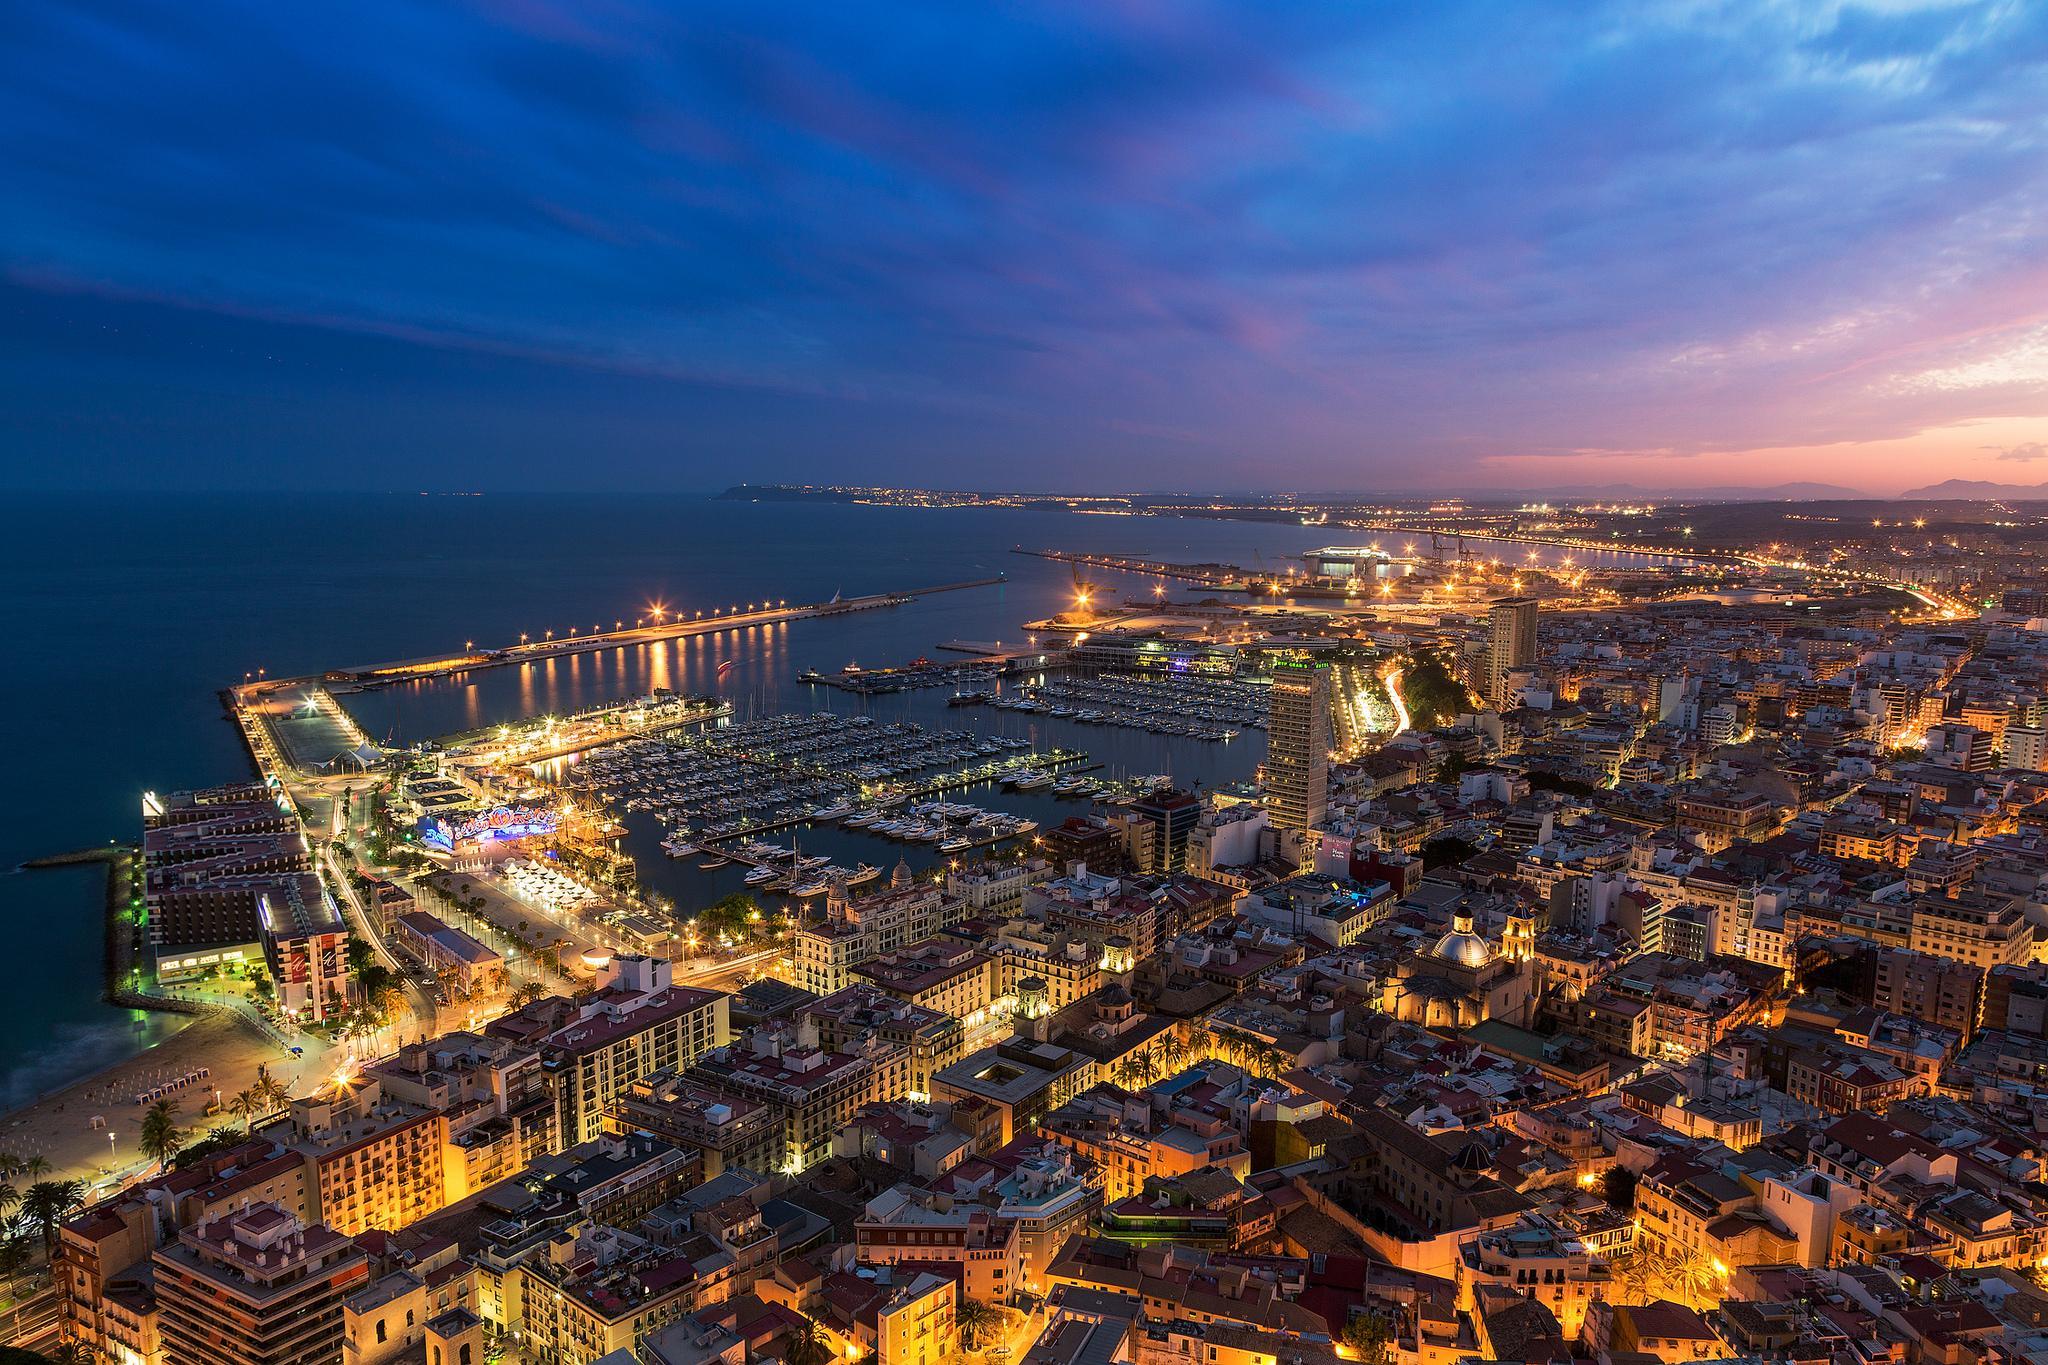 огни город море сумерки lights the city sea twilight  № 2659562 бесплатно